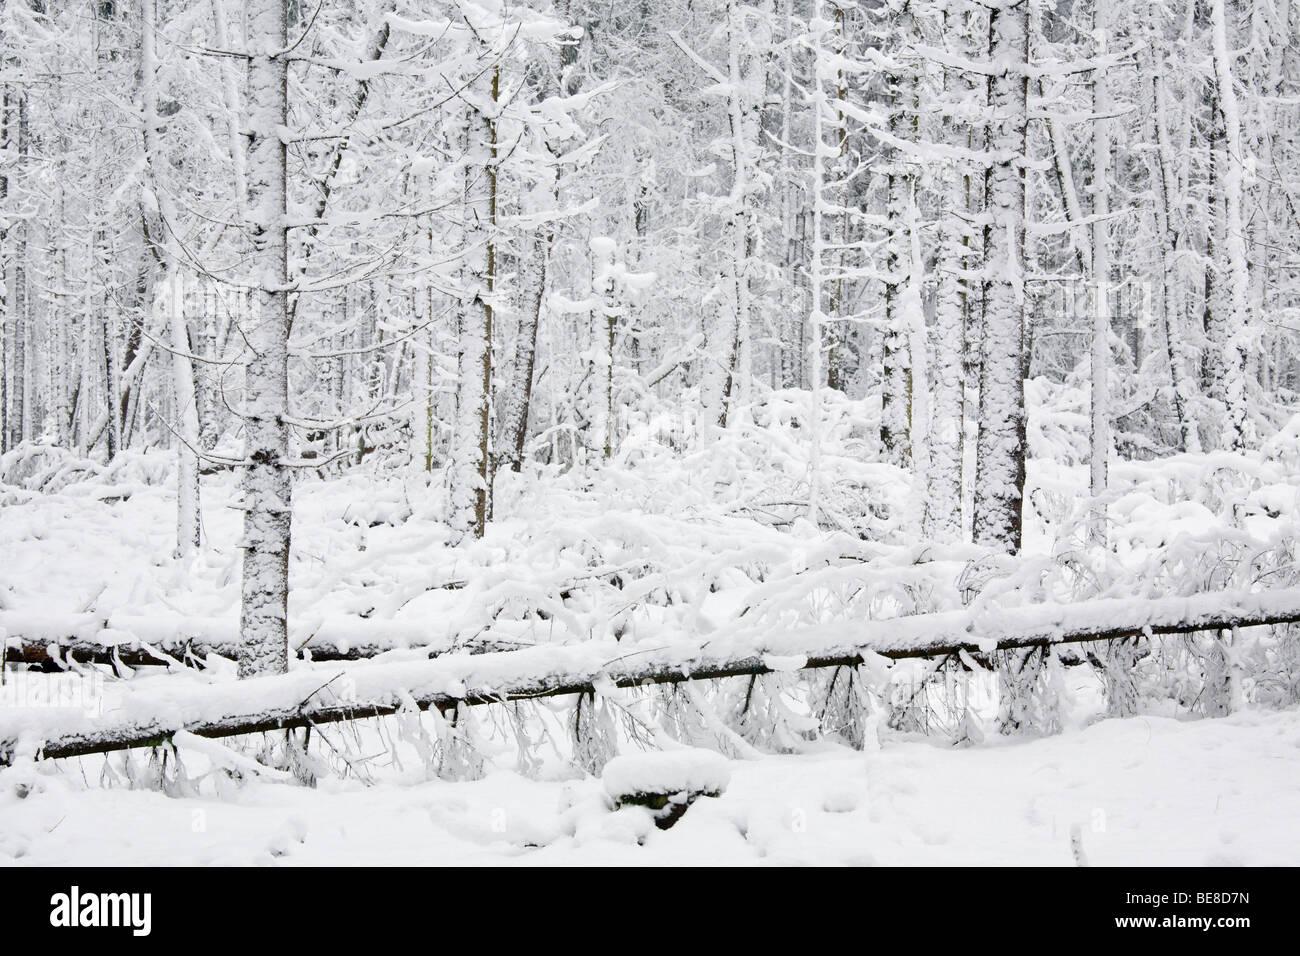 Naaldbos in de sneeuw; coniferous forest with snow - Stock Image